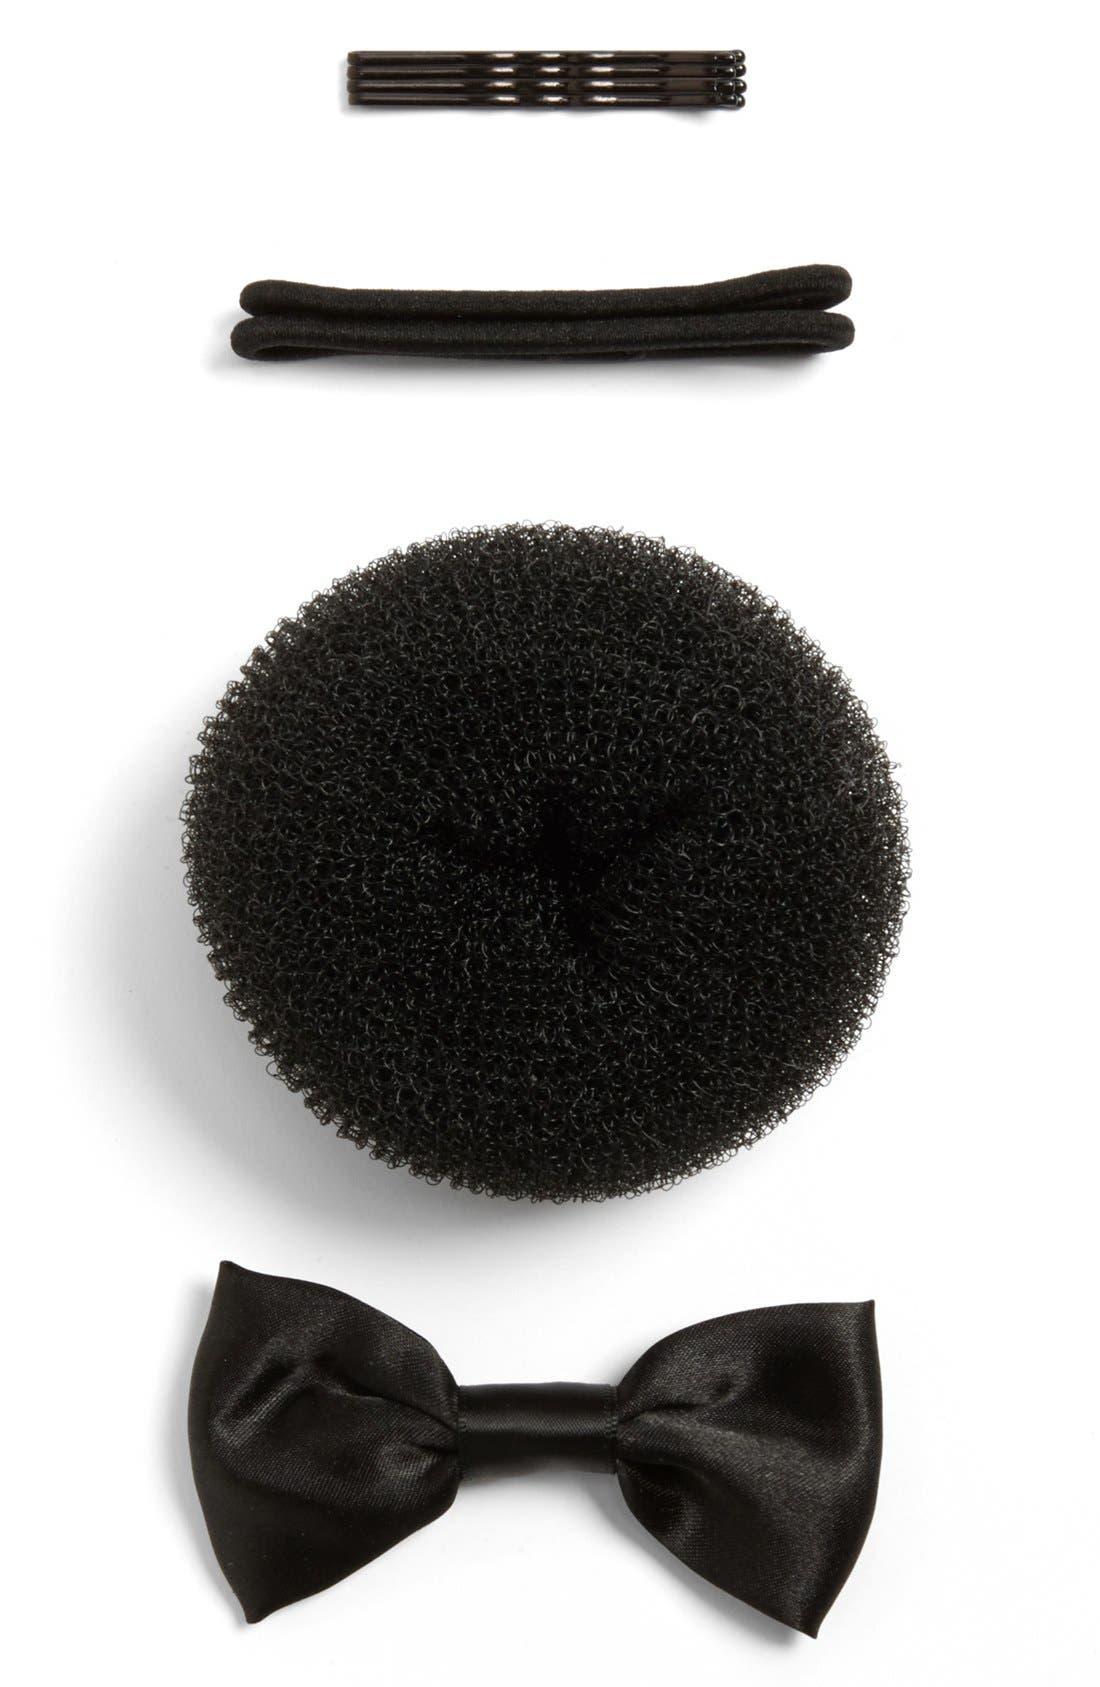 Alternate Image 1 Selected - Capelli of New York Bow & Bun Shaper Kit (Juniors) (Online Only)